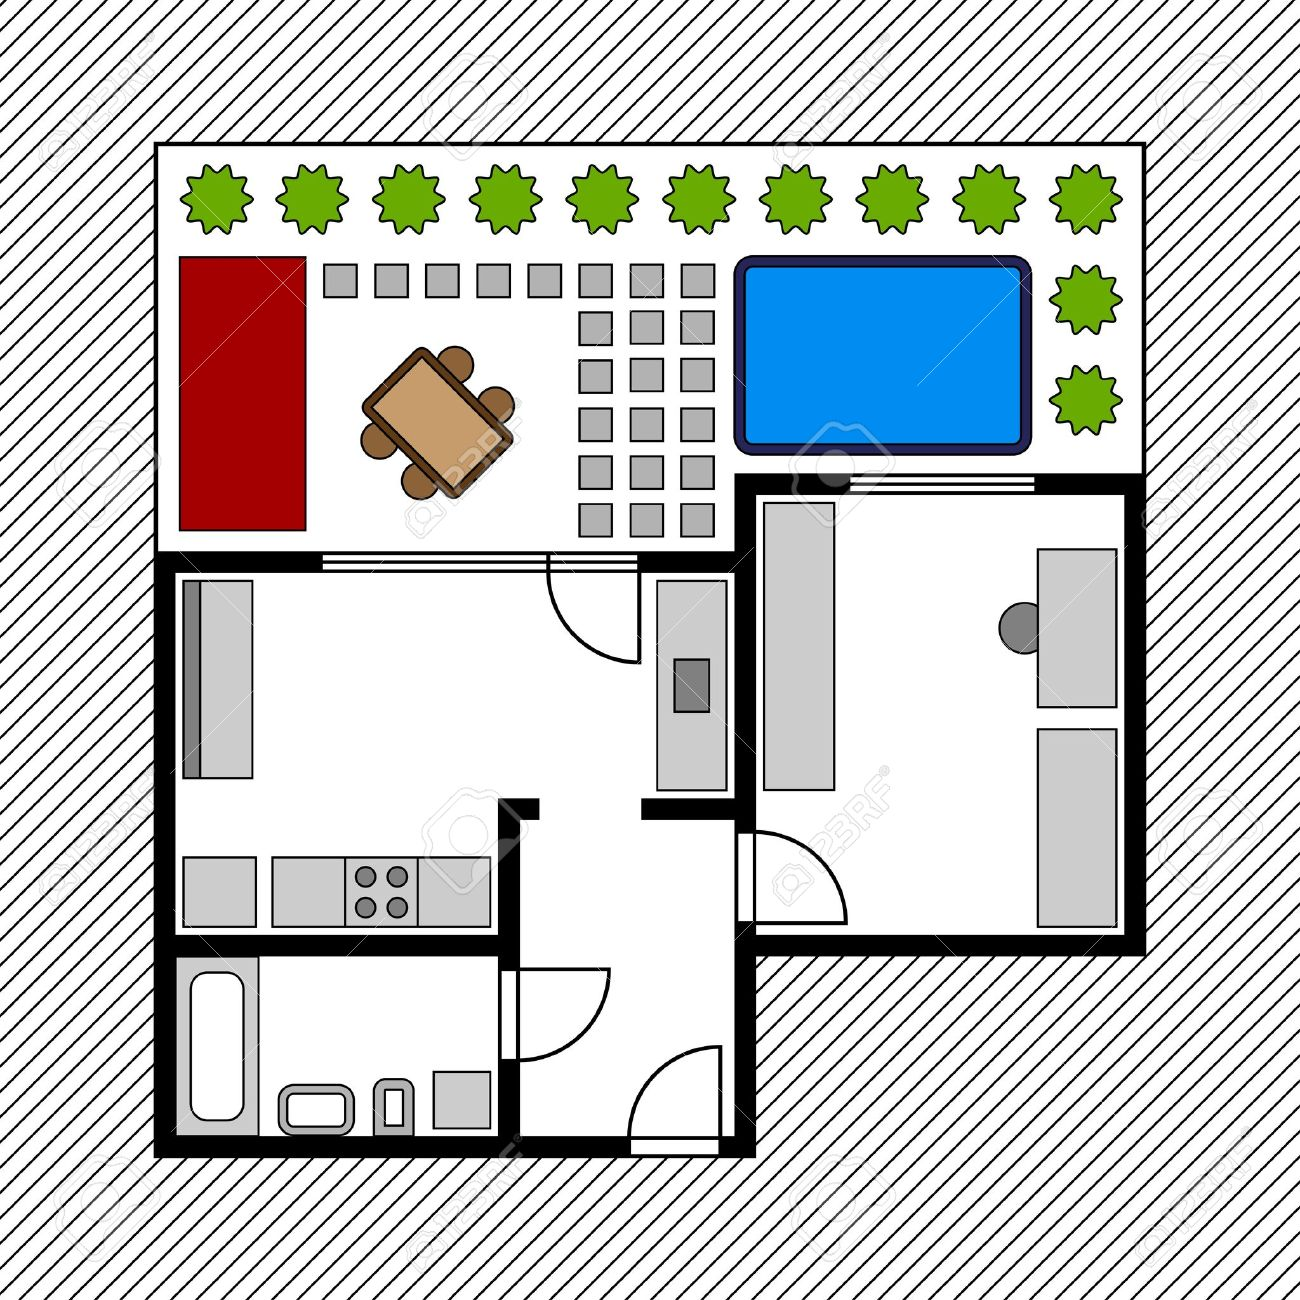 Vector House Floor Plan With Garden Royalty Free Cliparts, Vectors.